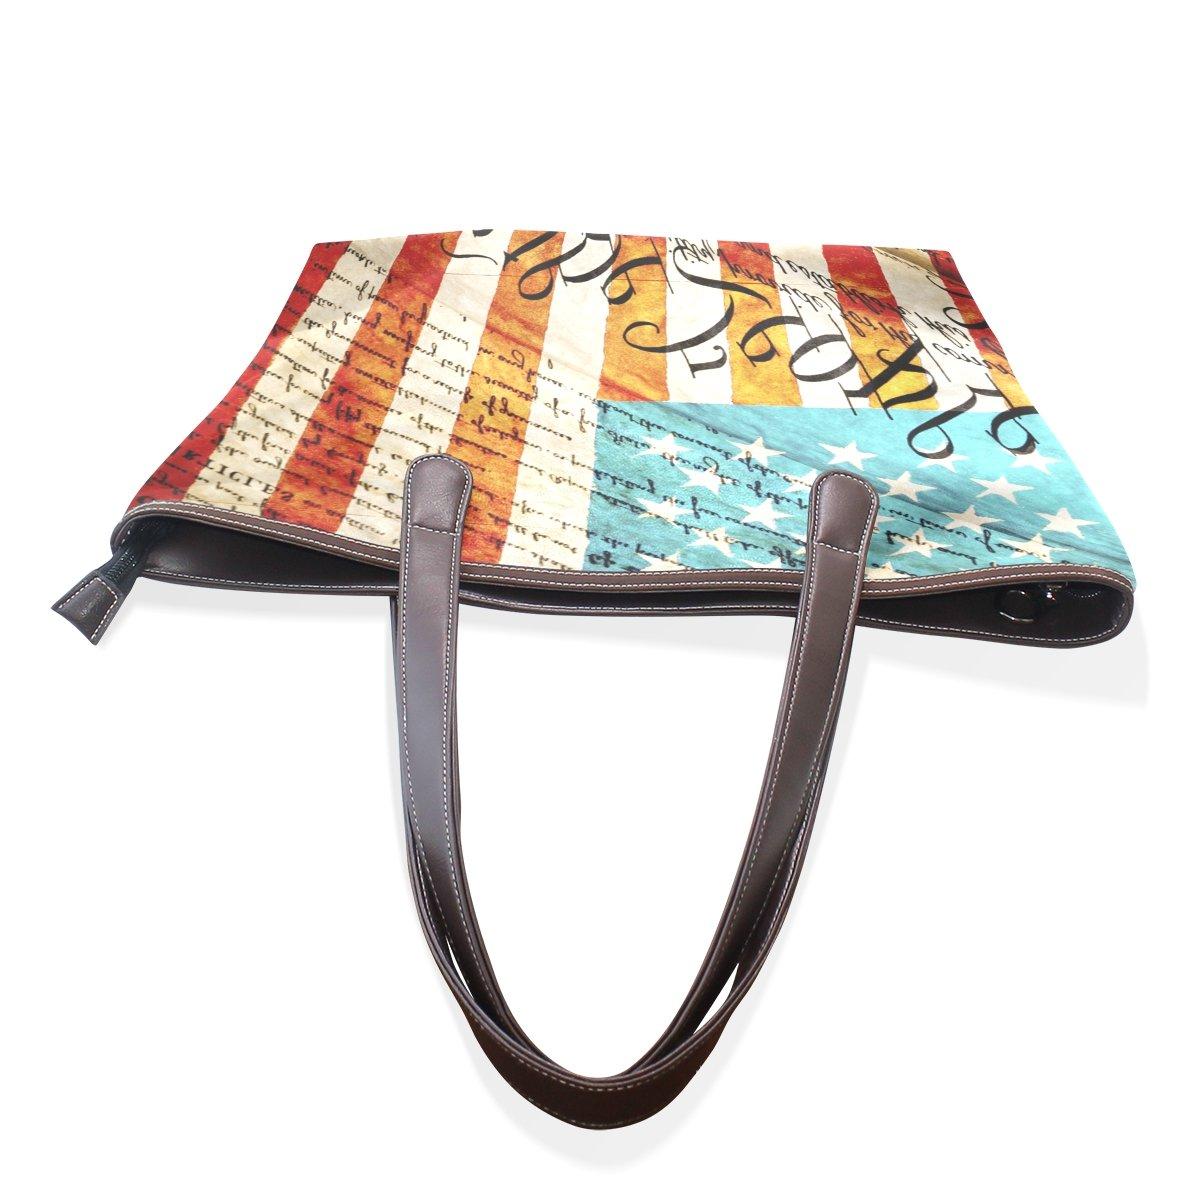 DEYYA American Flag Handbag Tote Shoulder Bags PU Leather Large Shopping Bag for Women Girls